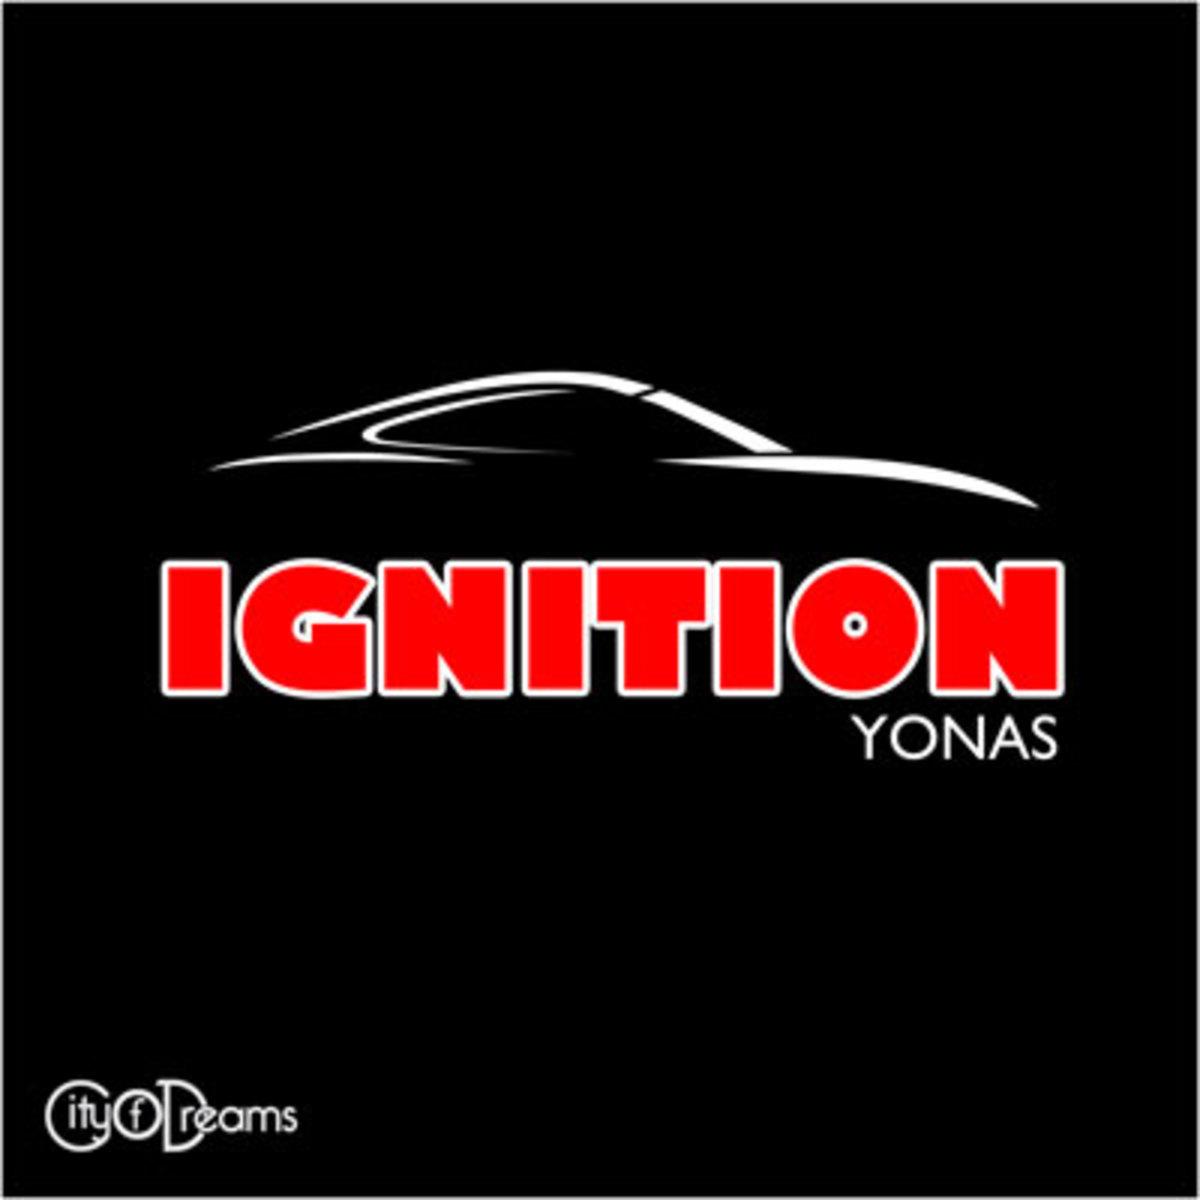 yonas-ignition.jpg